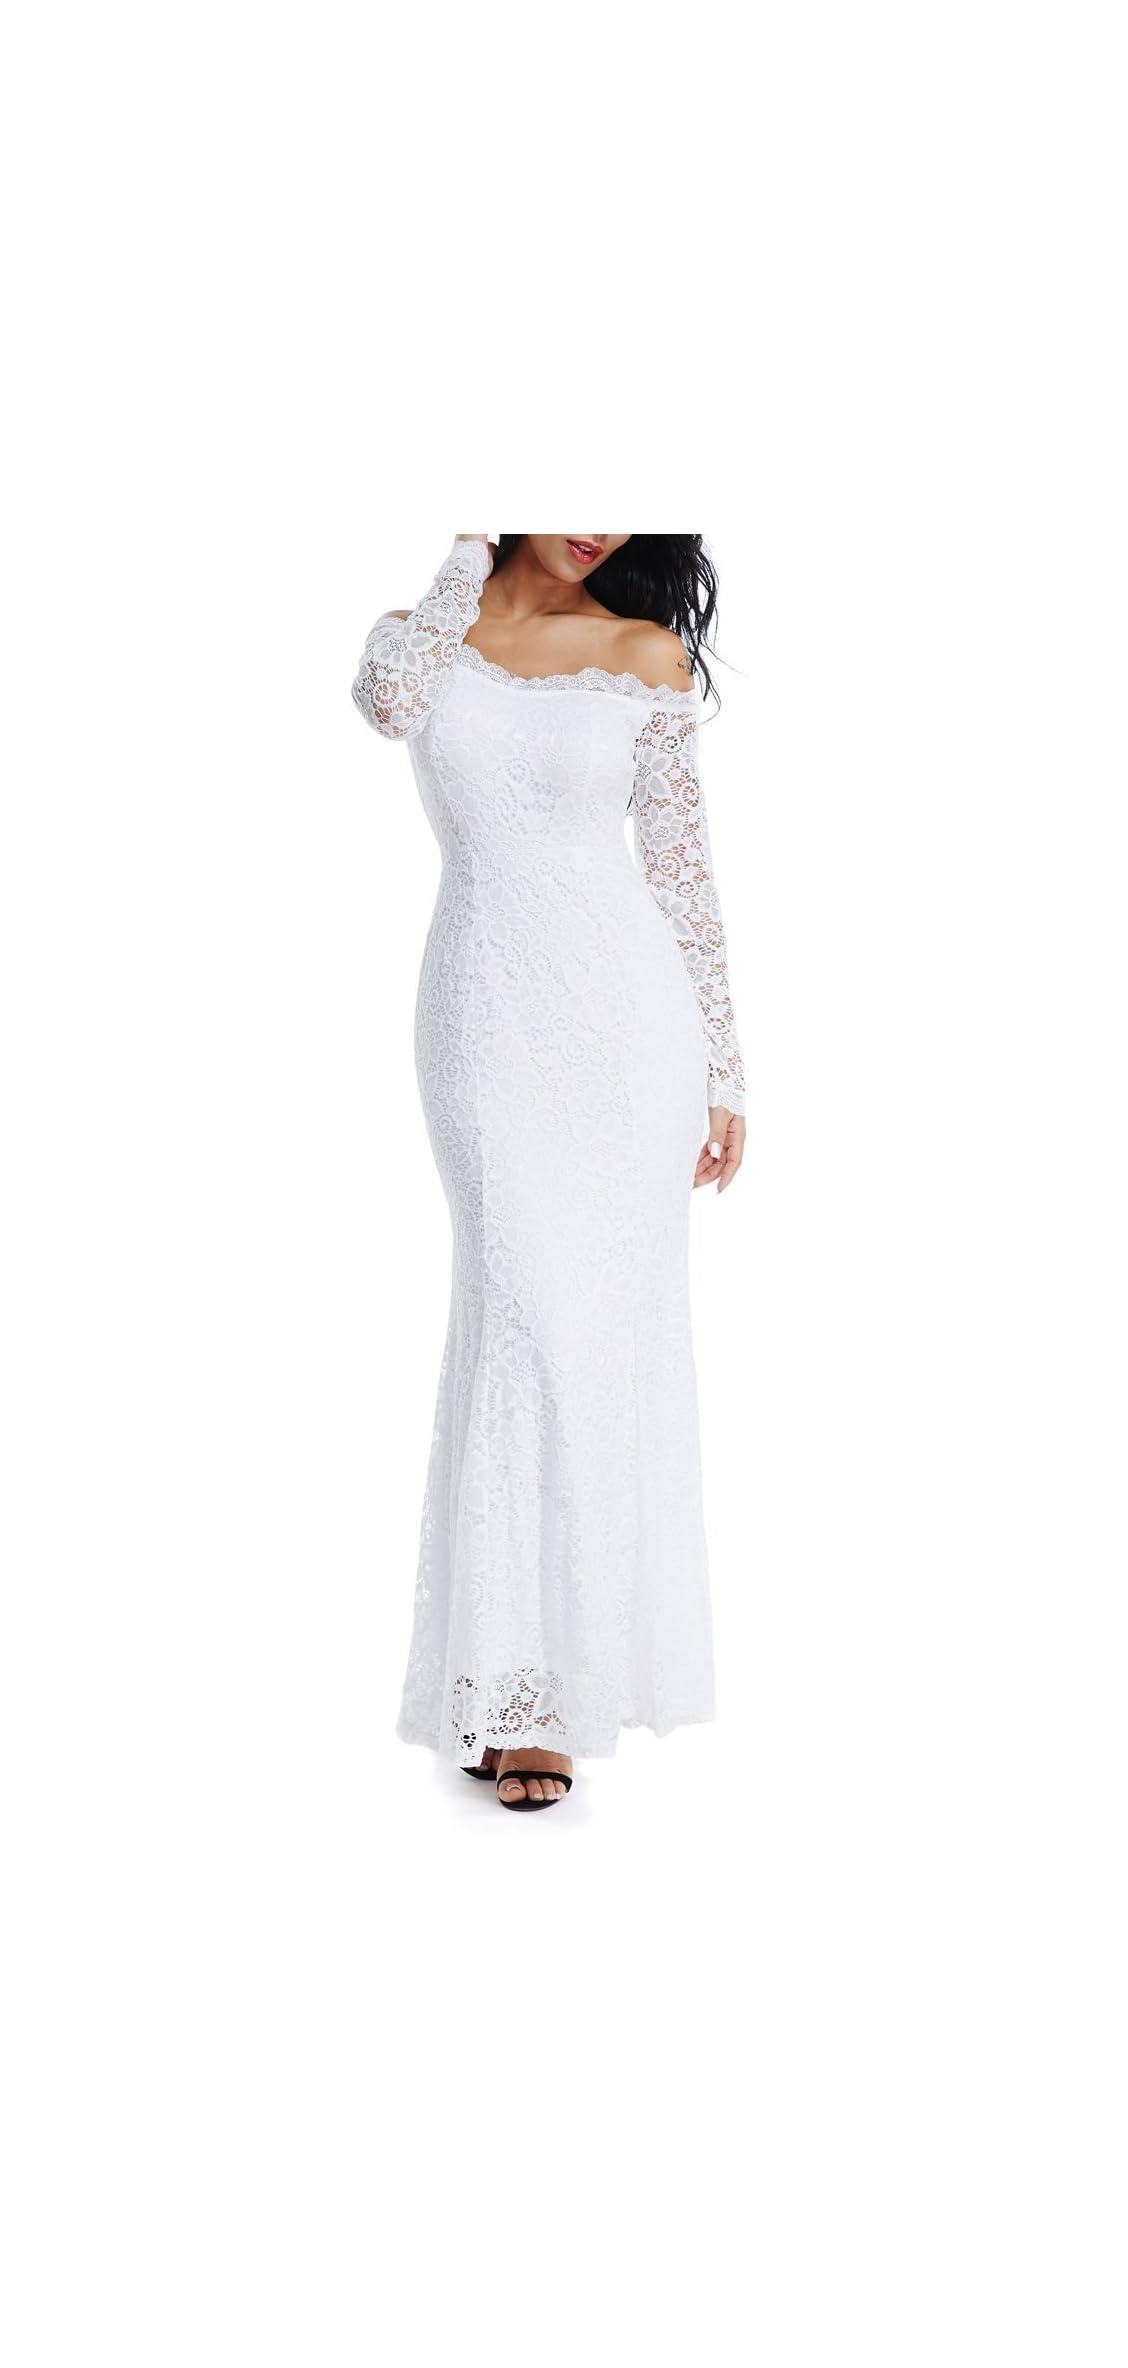 Women's Floral Lace Long Sleeve Off Shoulder Wedding